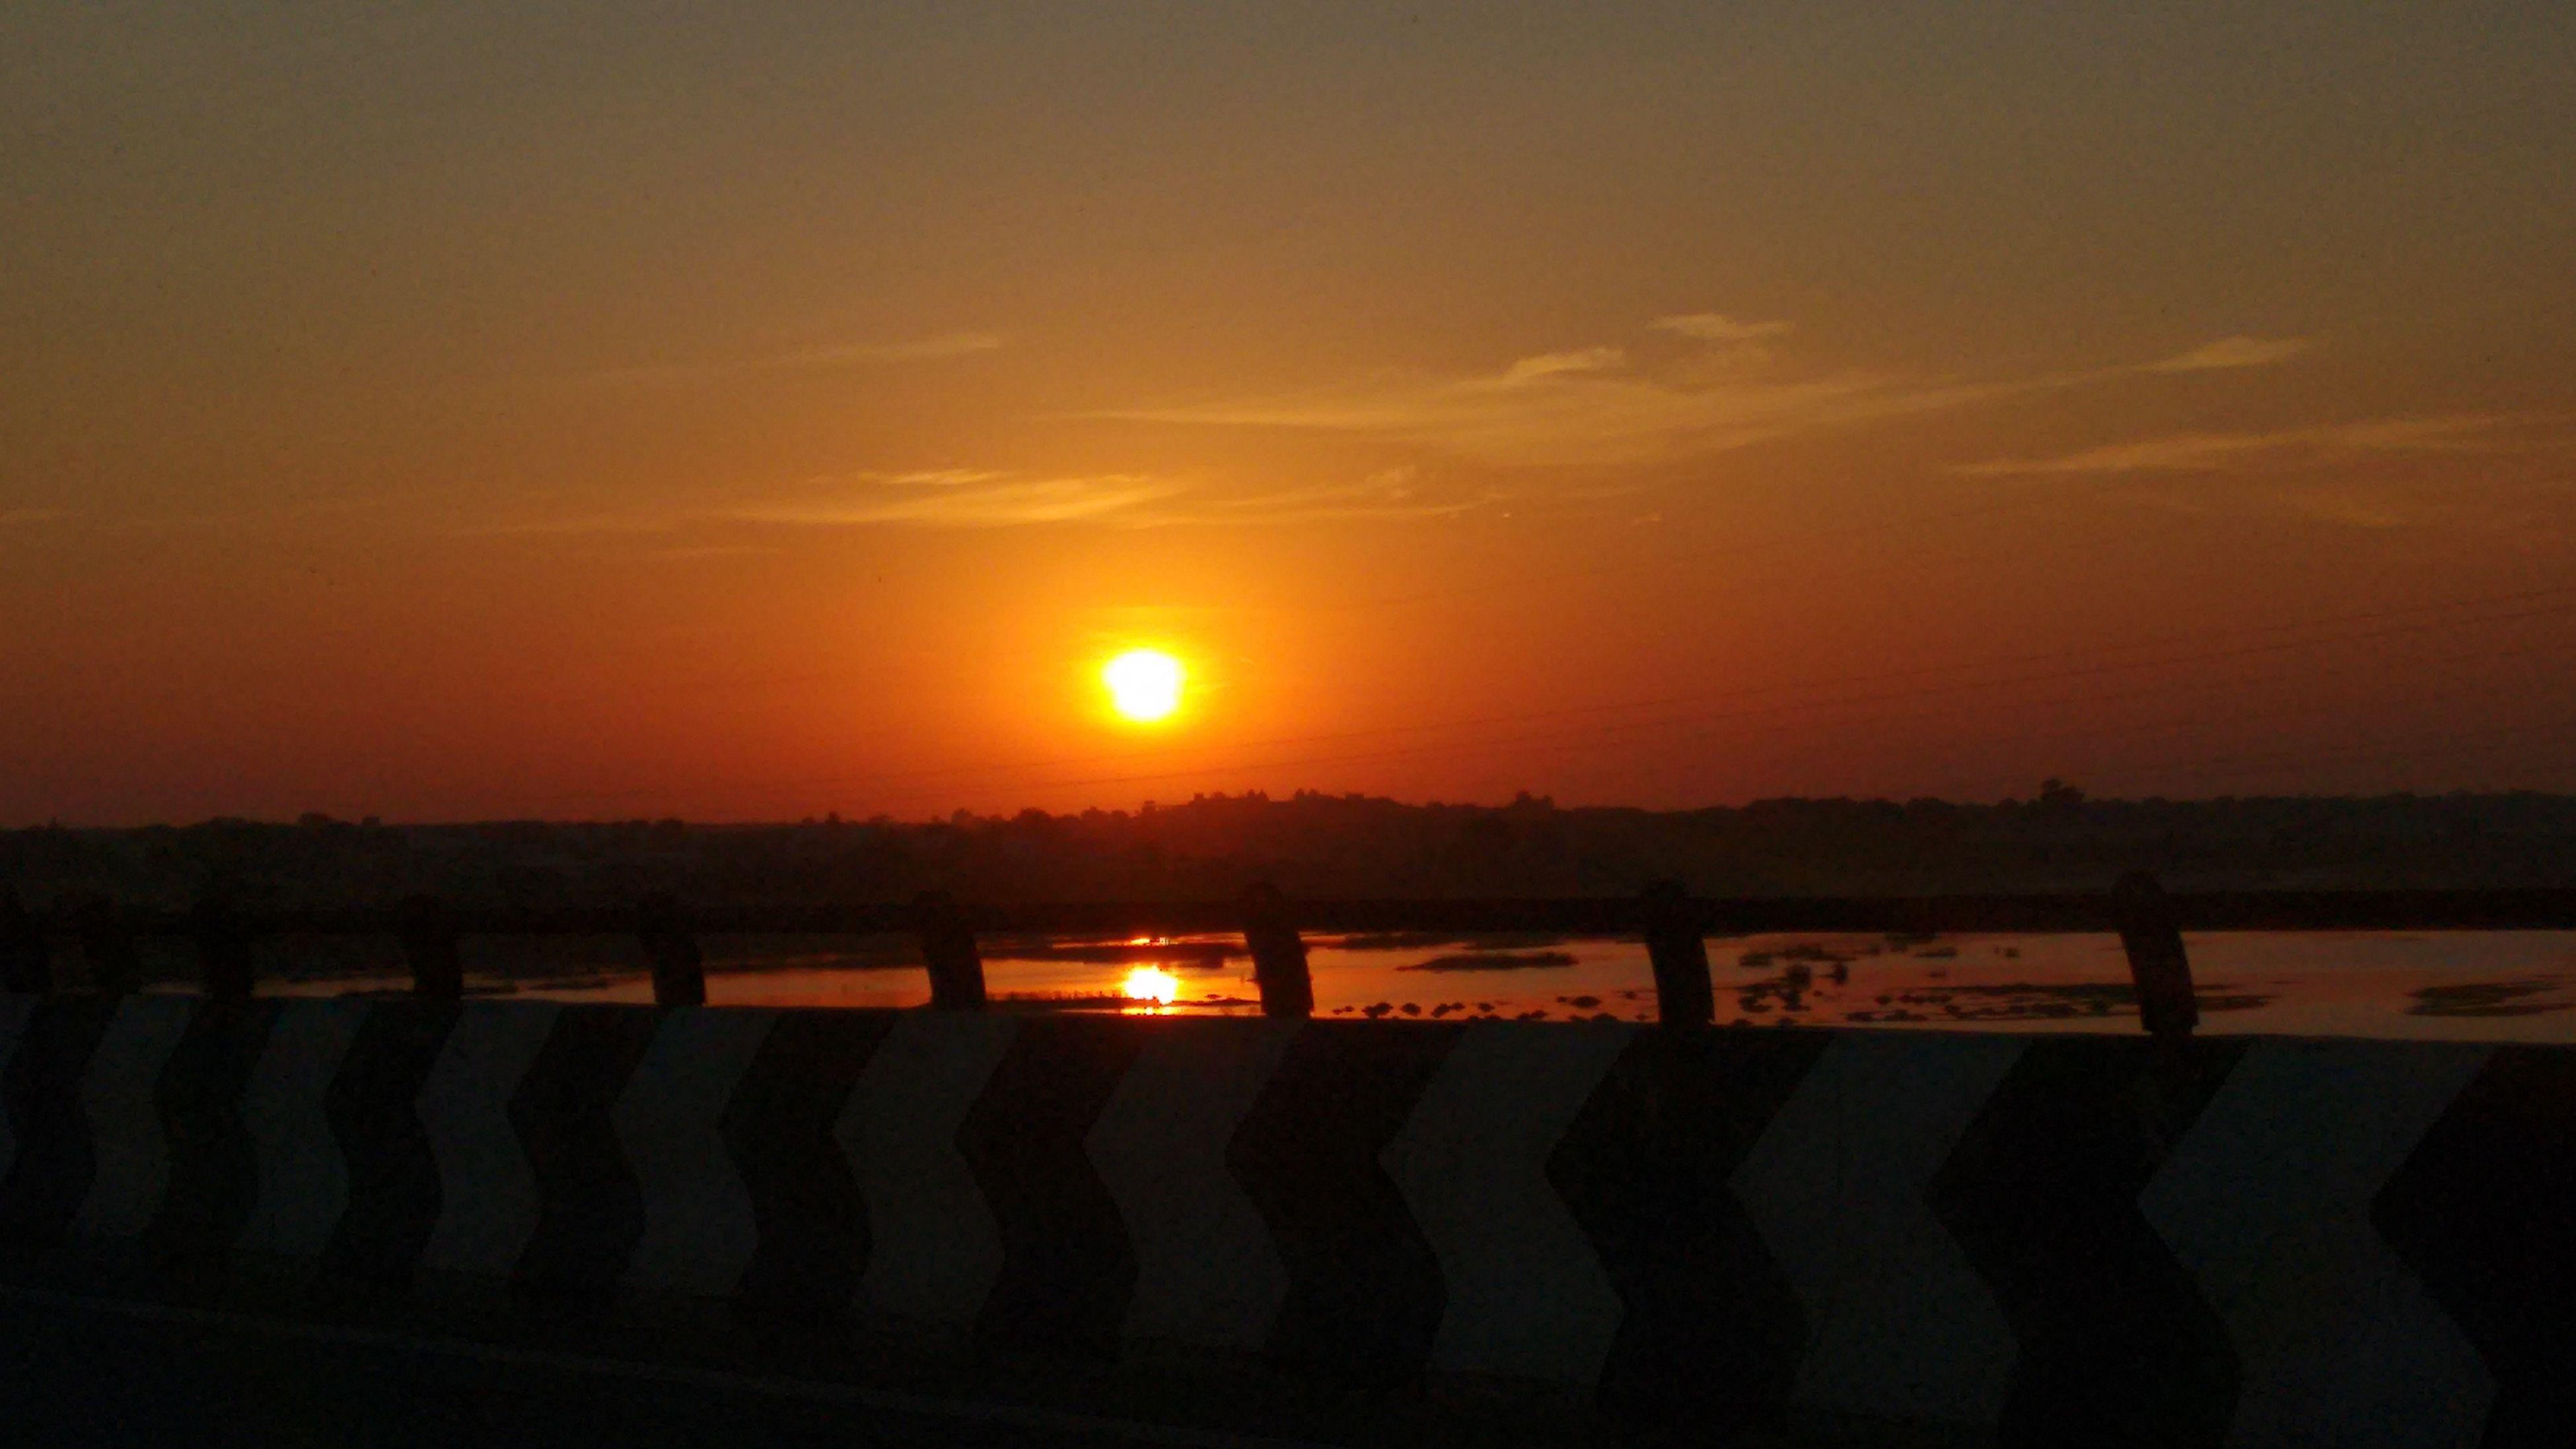 sunset, sun, orange color, silhouette, scenics, sky, tranquil scene, tranquility, beauty in nature, landscape, nature, idyllic, sunlight, cloud - sky, lens flare, field, no people, railing, outdoors, sunbeam